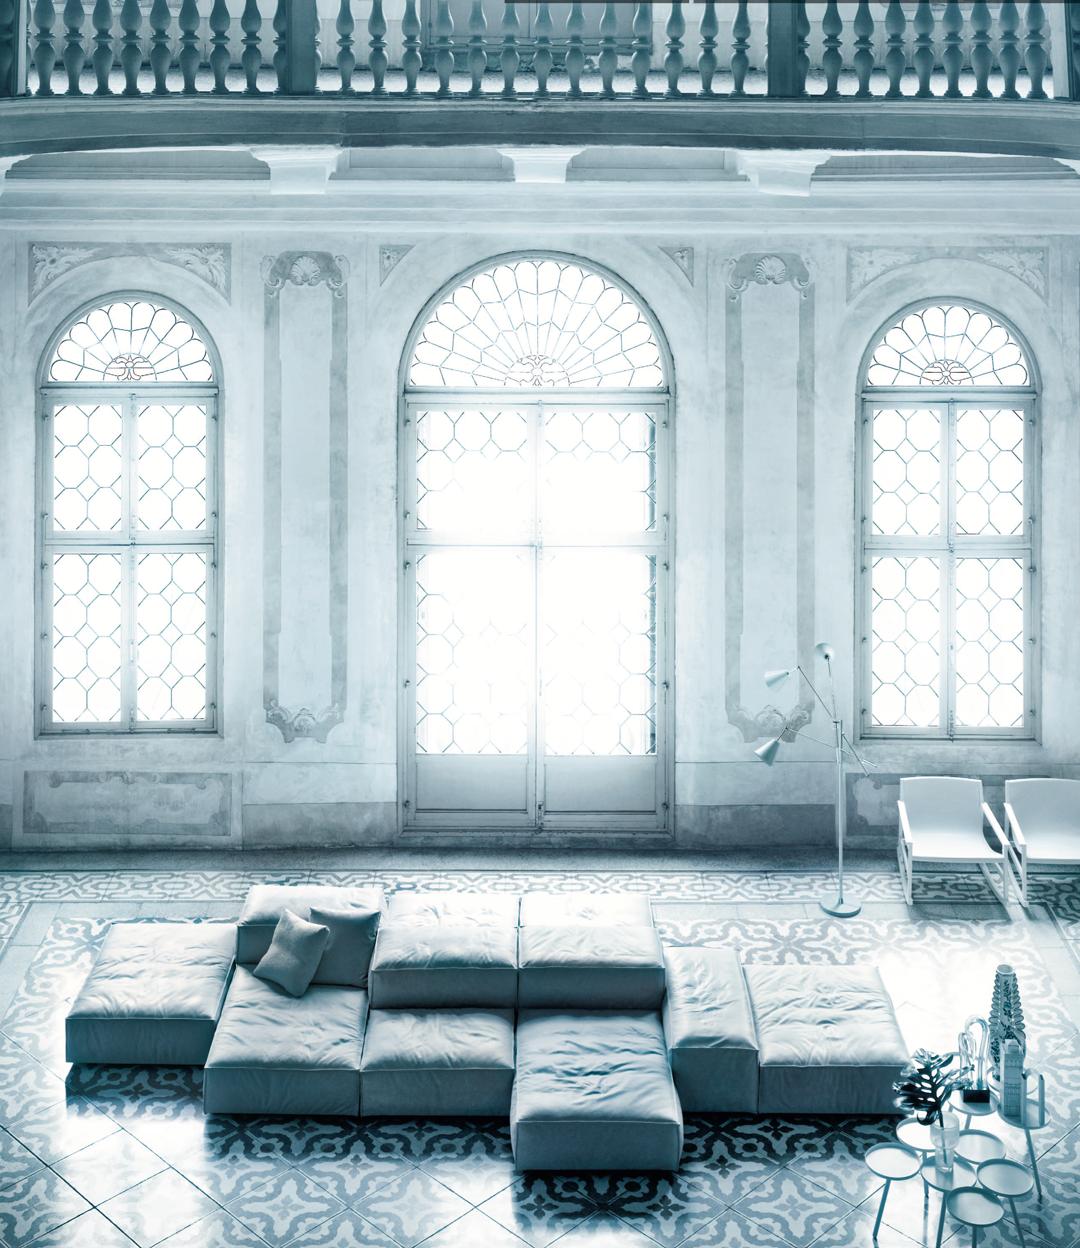 extra soft sofa piero lissoni - Google Search | le mobilier ...